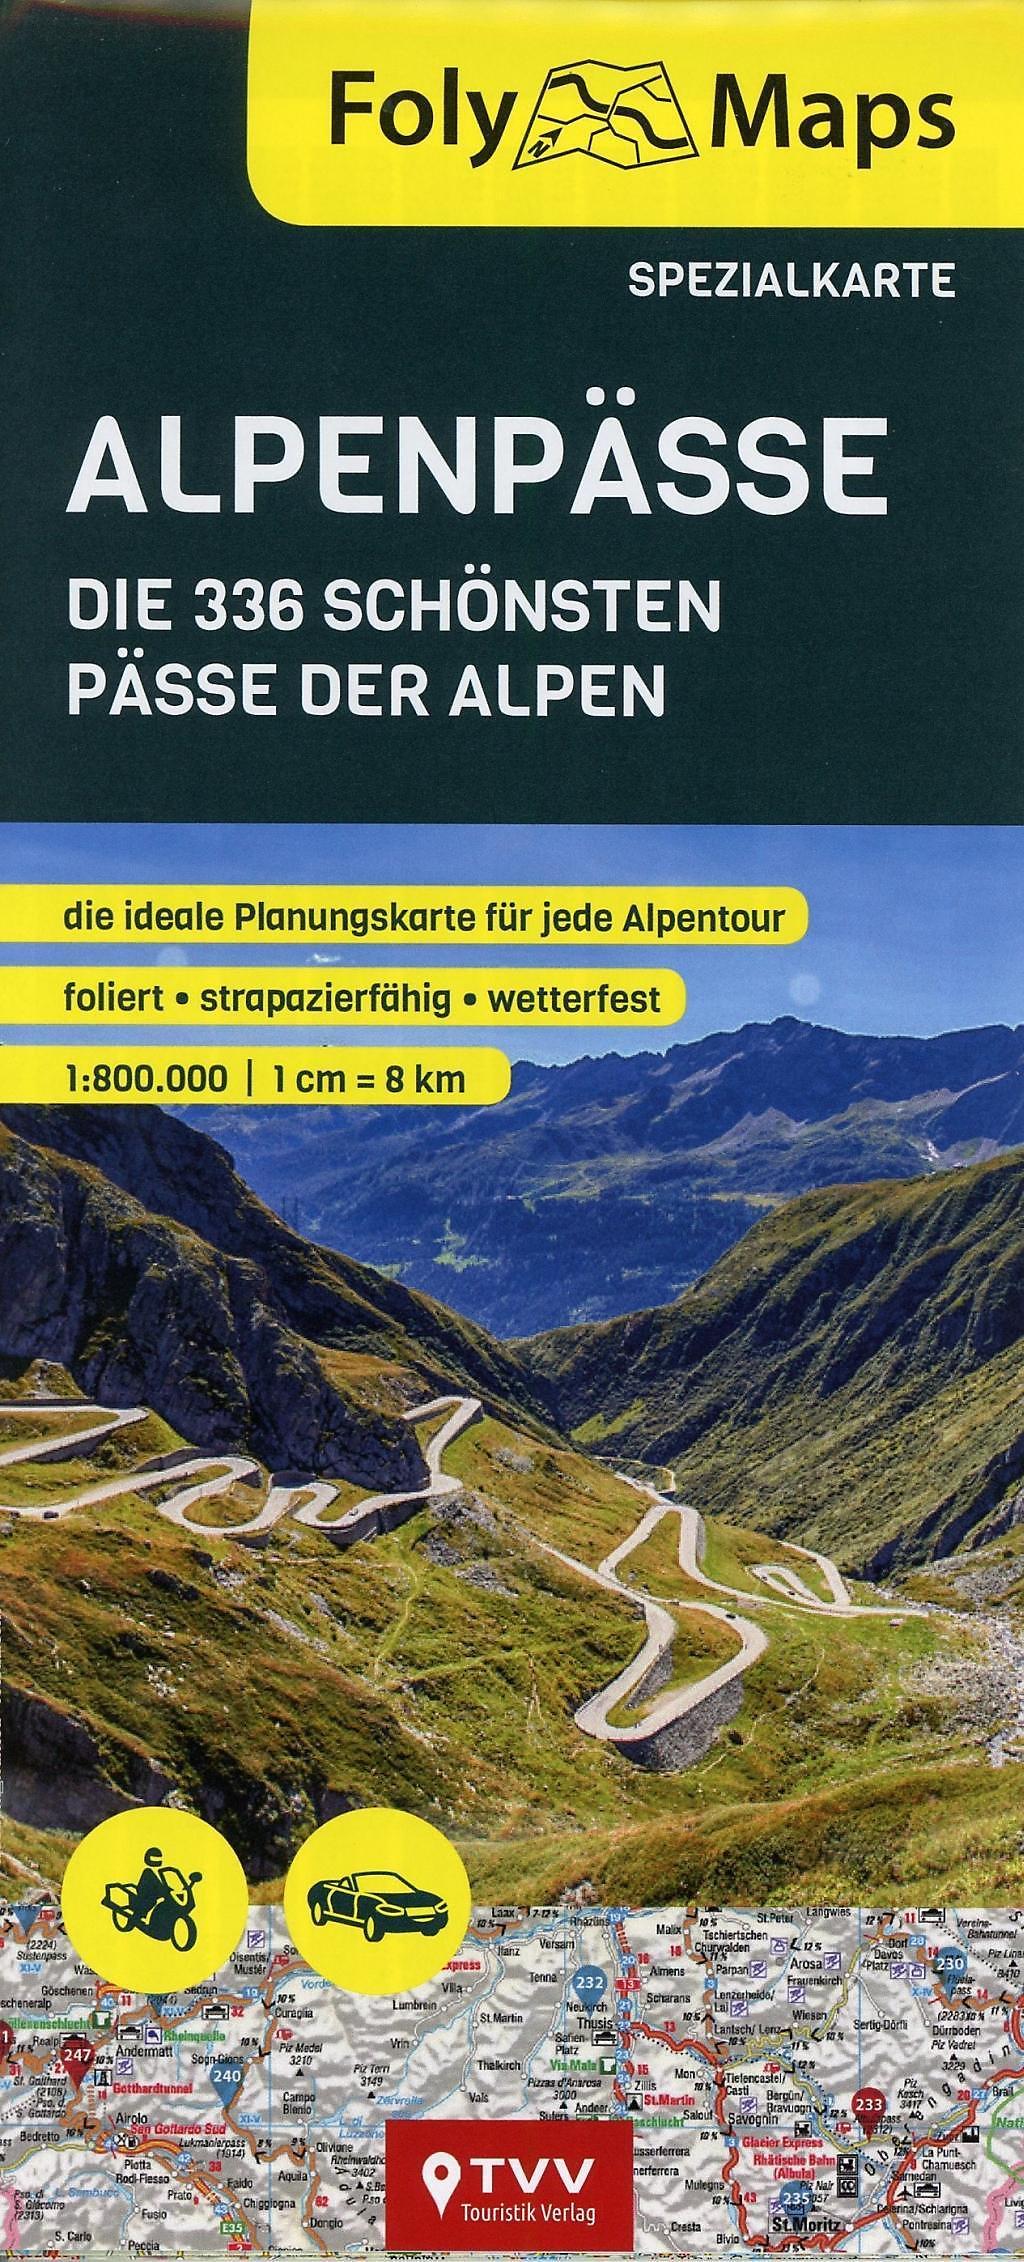 Alpenpässe Karte.Folymaps Alpenpässe Spezialkarte Buch Bei Weltbild Ch Bestellen